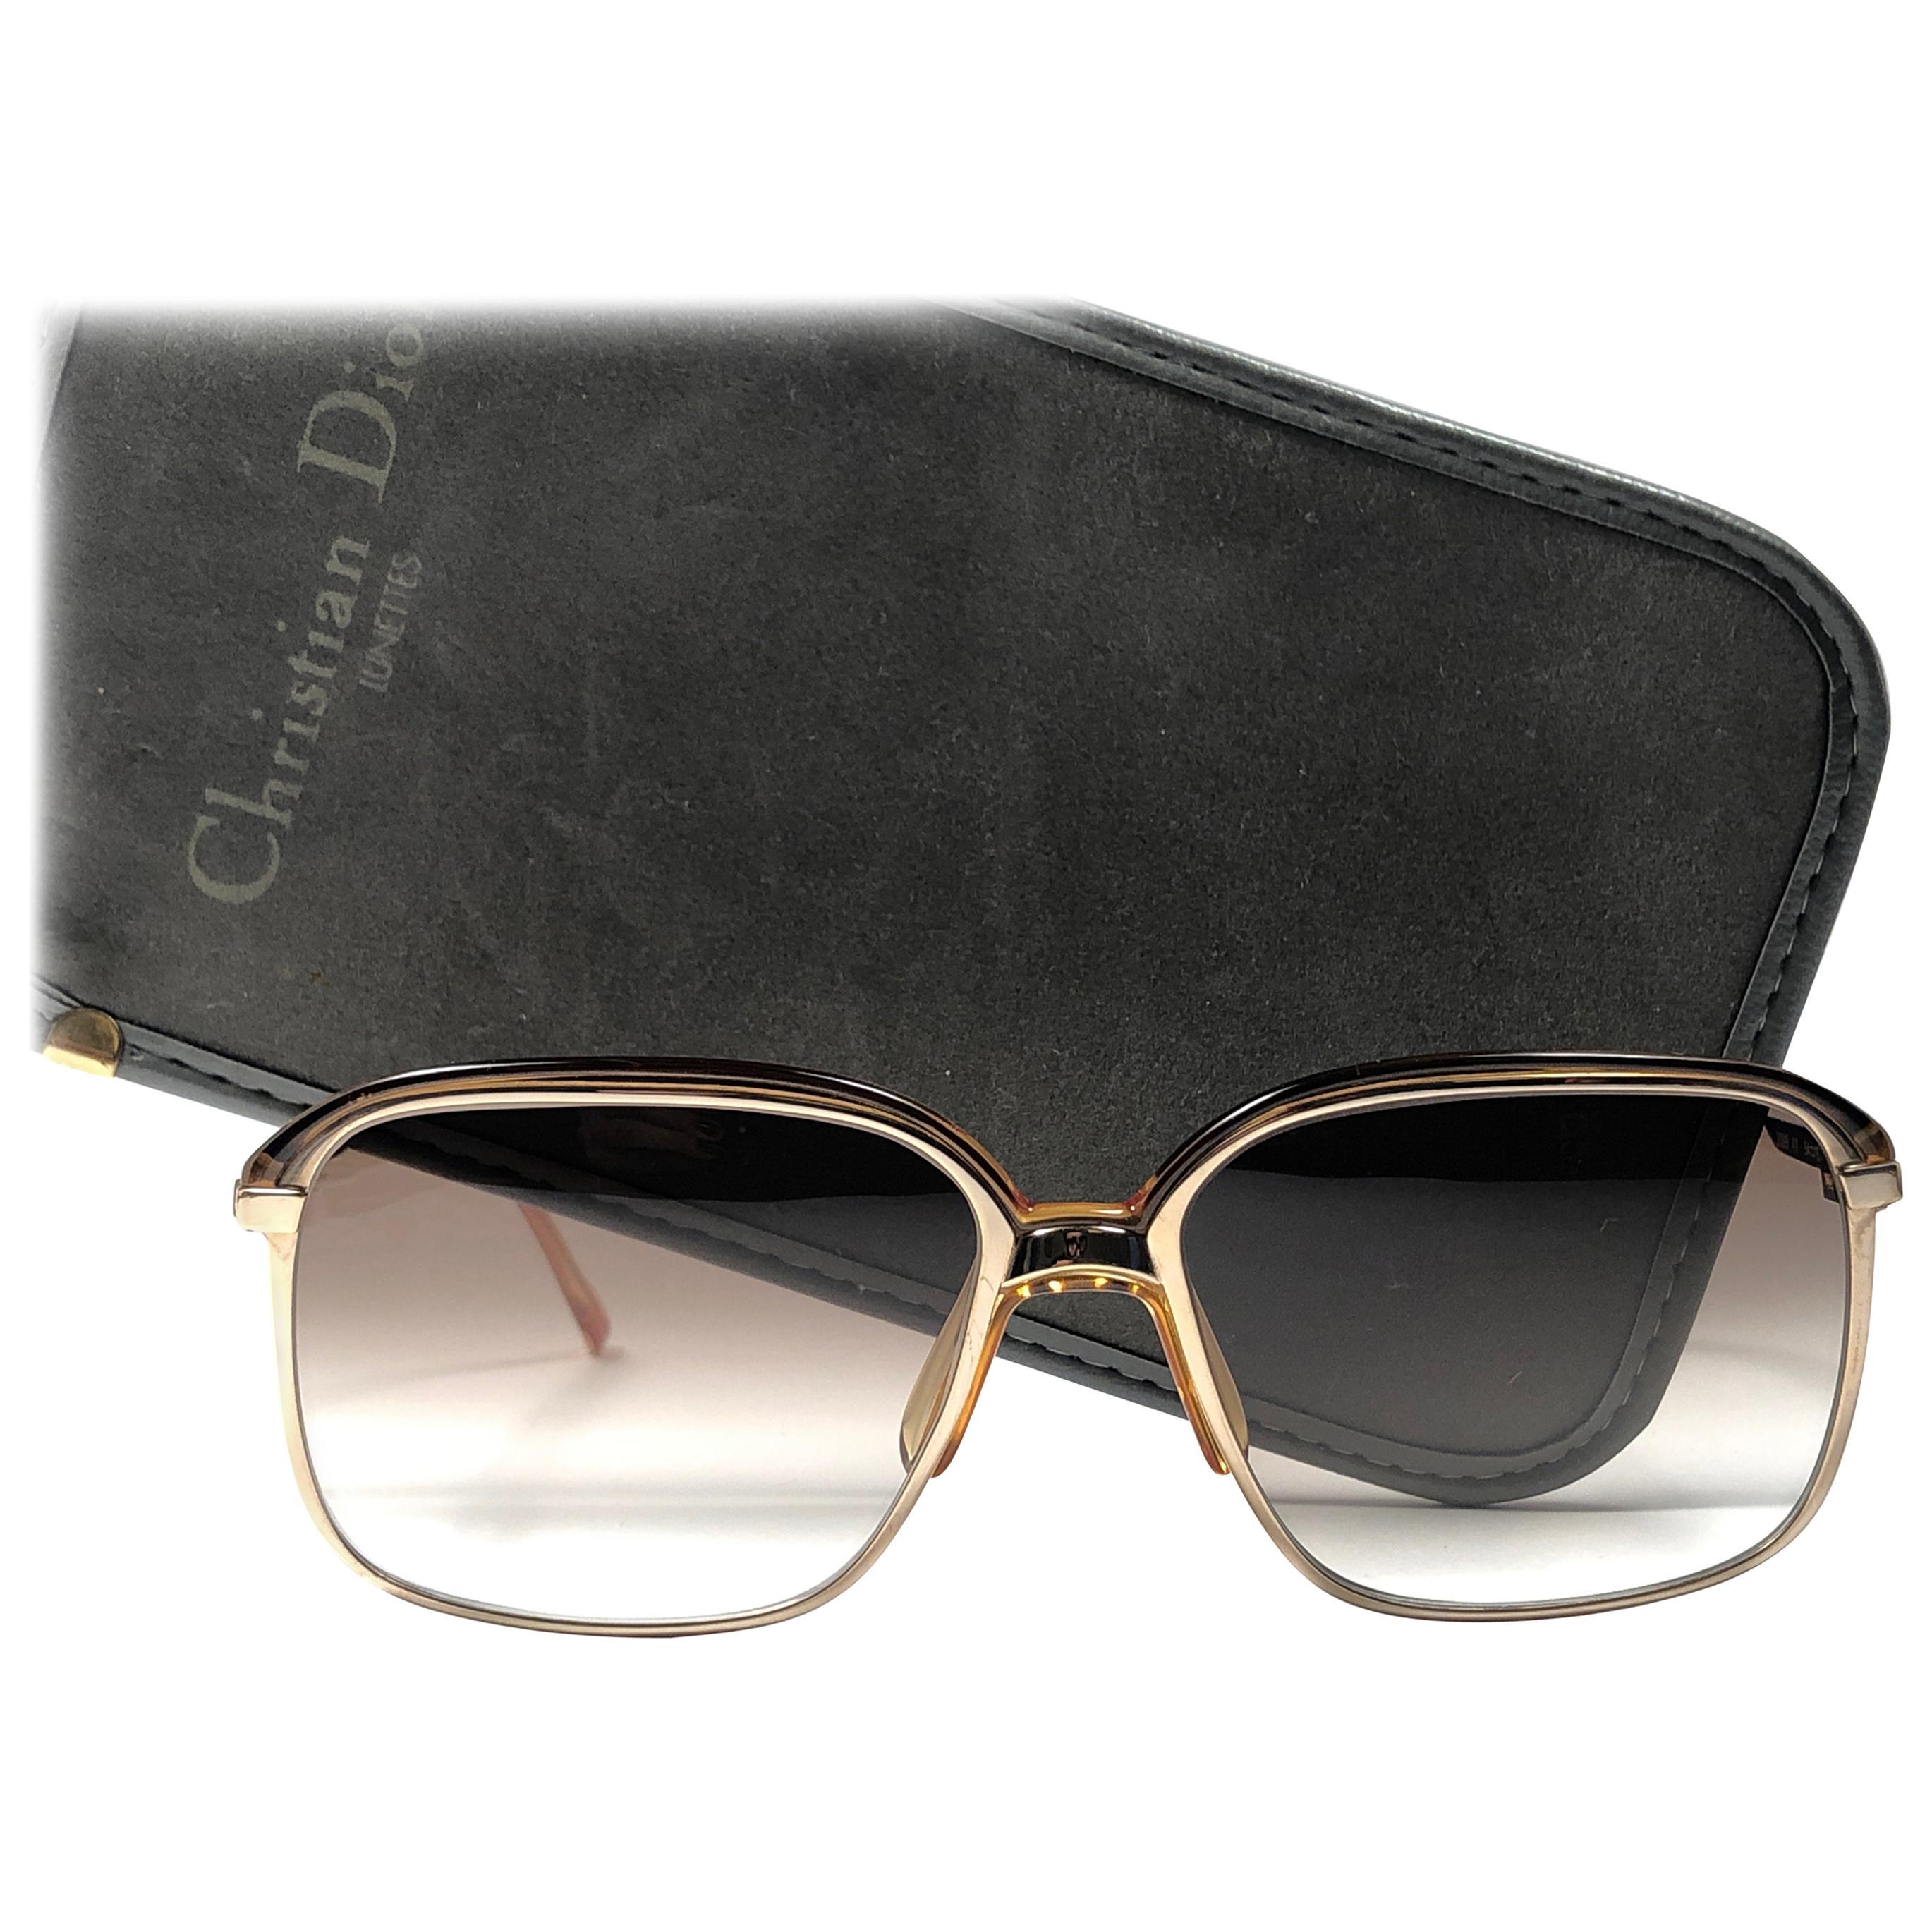 3ba4cb1974 Vintage Christian Dior Sunglasses - 246 For Sale at 1stdibs